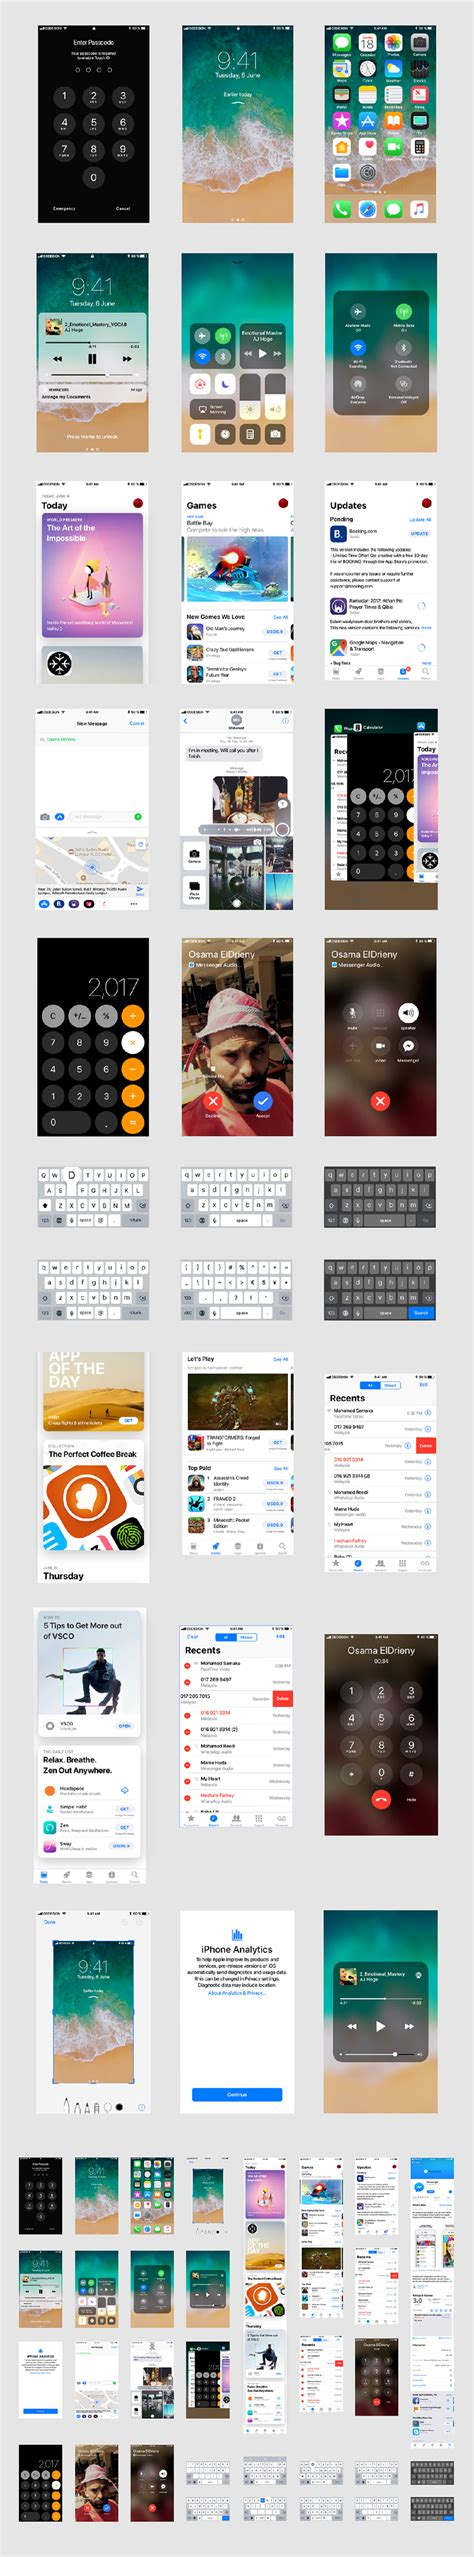 Iphone X Mockup Ios 11 Gui For Adobe Xd Freebie Supply Adobe Xd Templates Ios